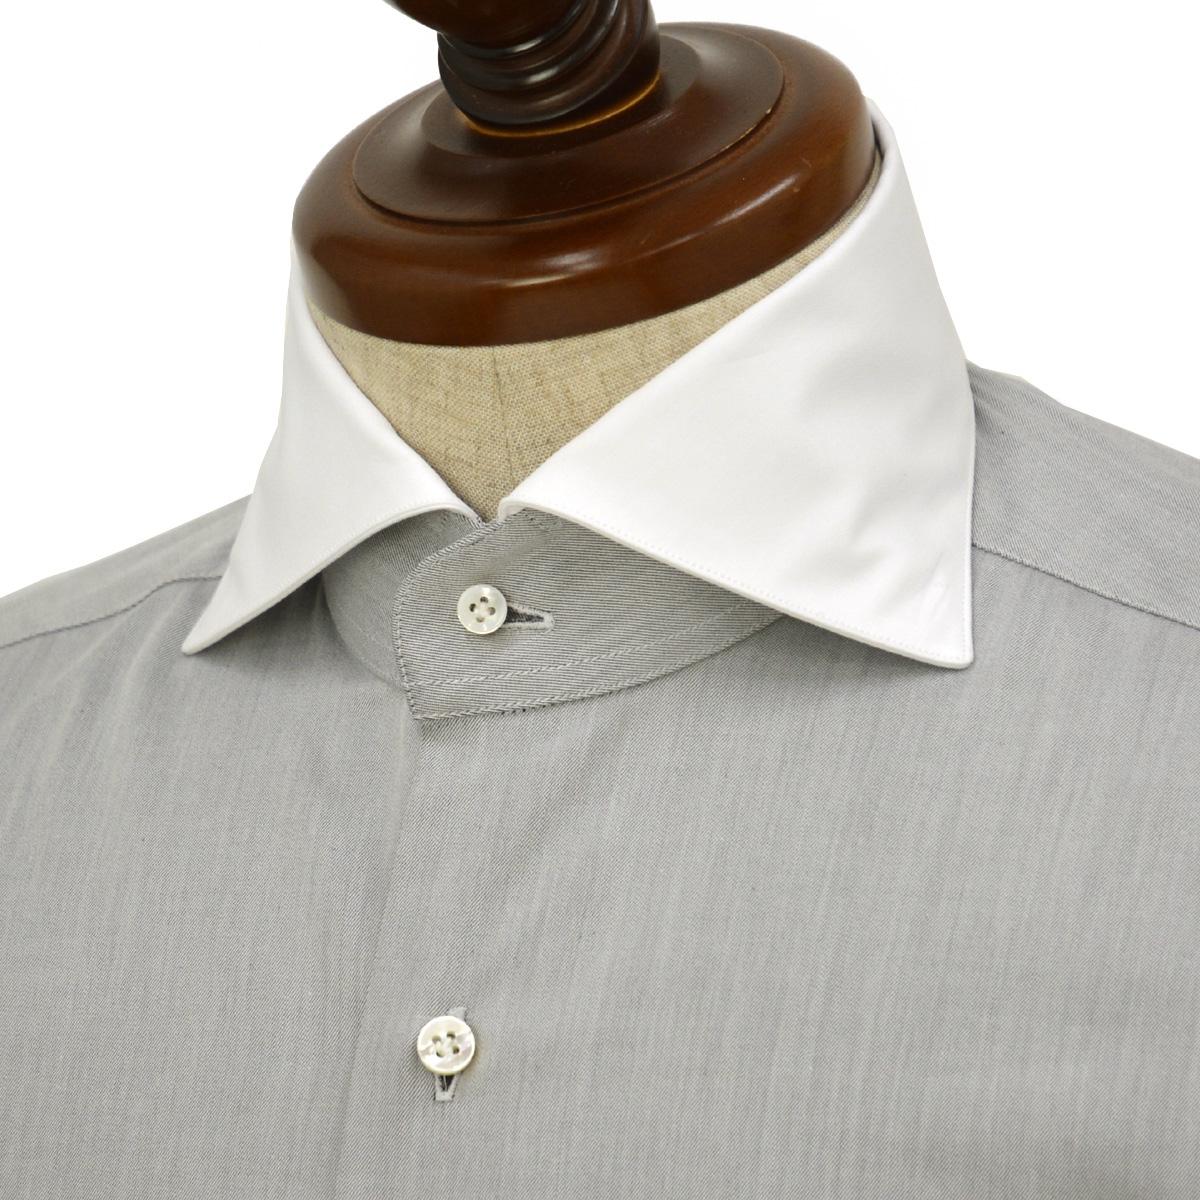 BARBA【バルバ】ドレスシャツ BRUNO I1U262552806U フラシ コットン クレリック ツイル グレー×ホワイト